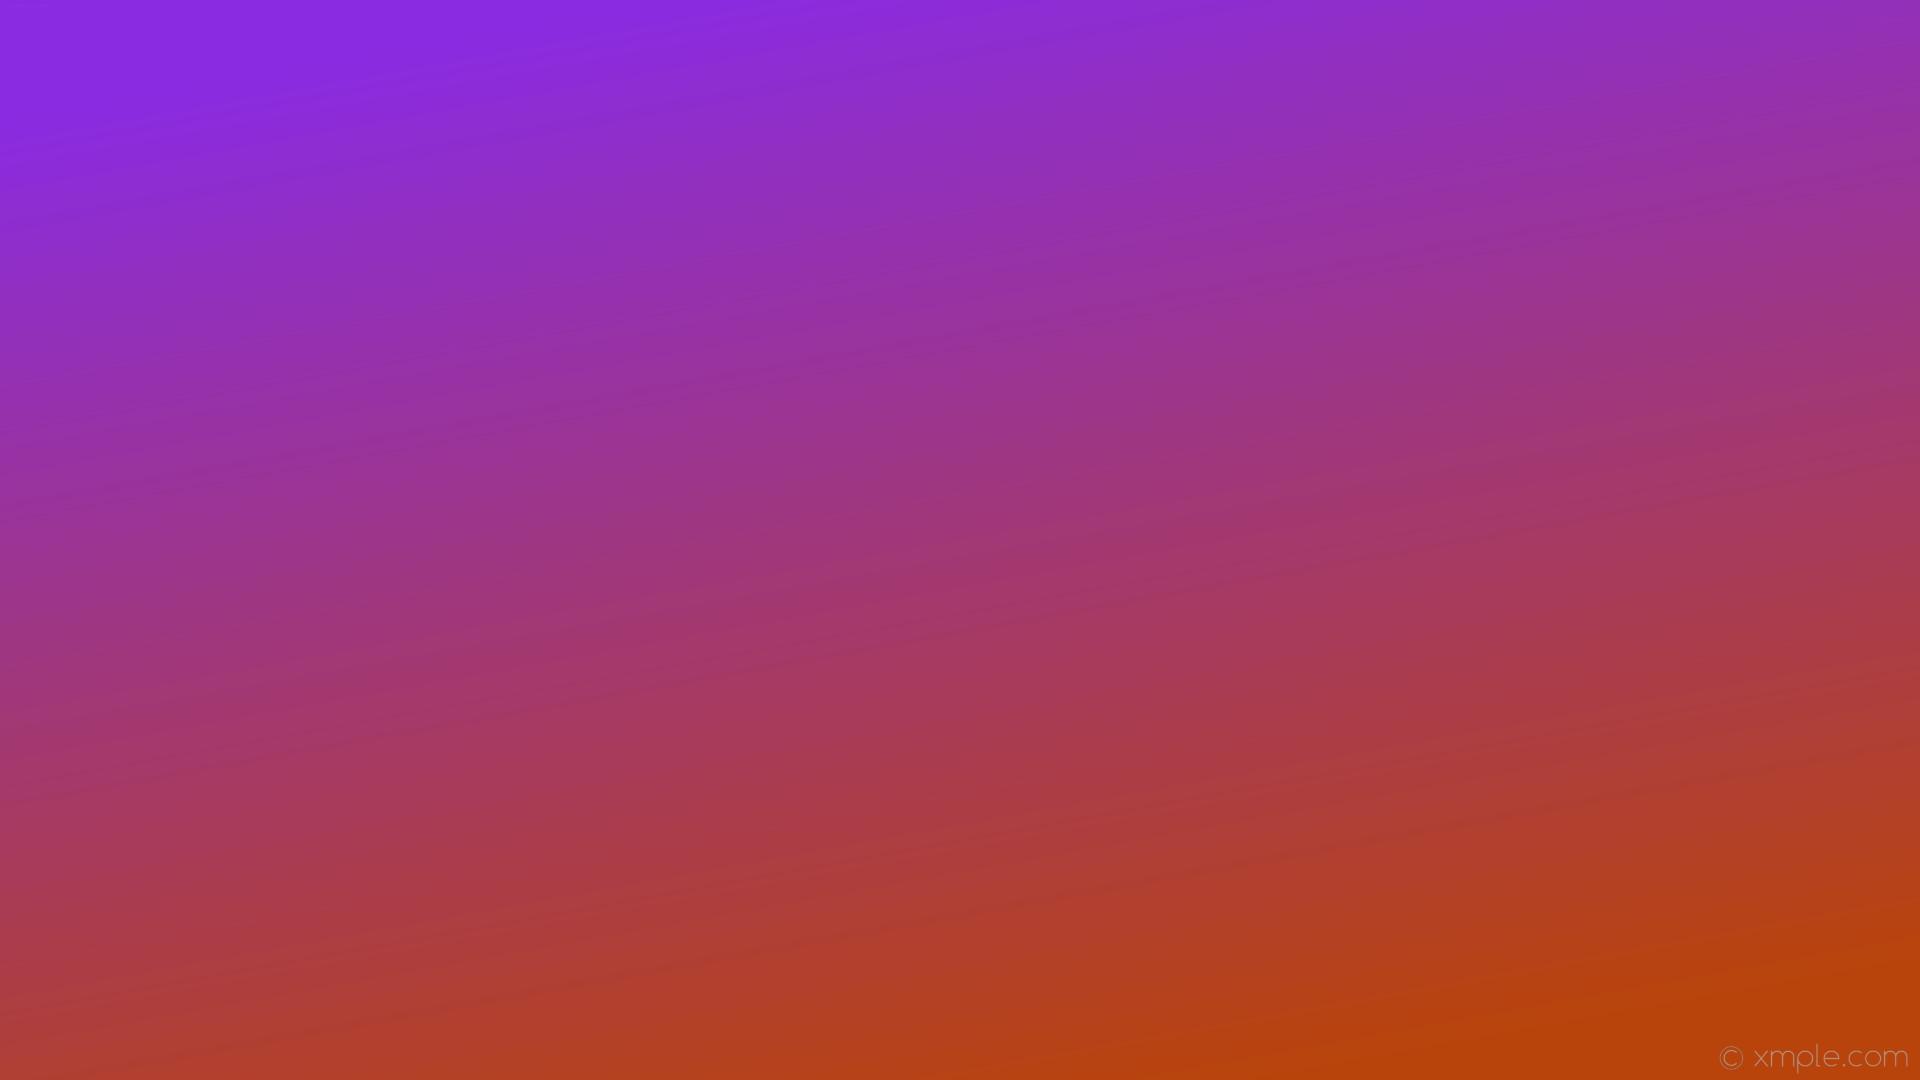 wallpaper gradient orange linear purple blue violet #8a2be2 #b9440b 120°